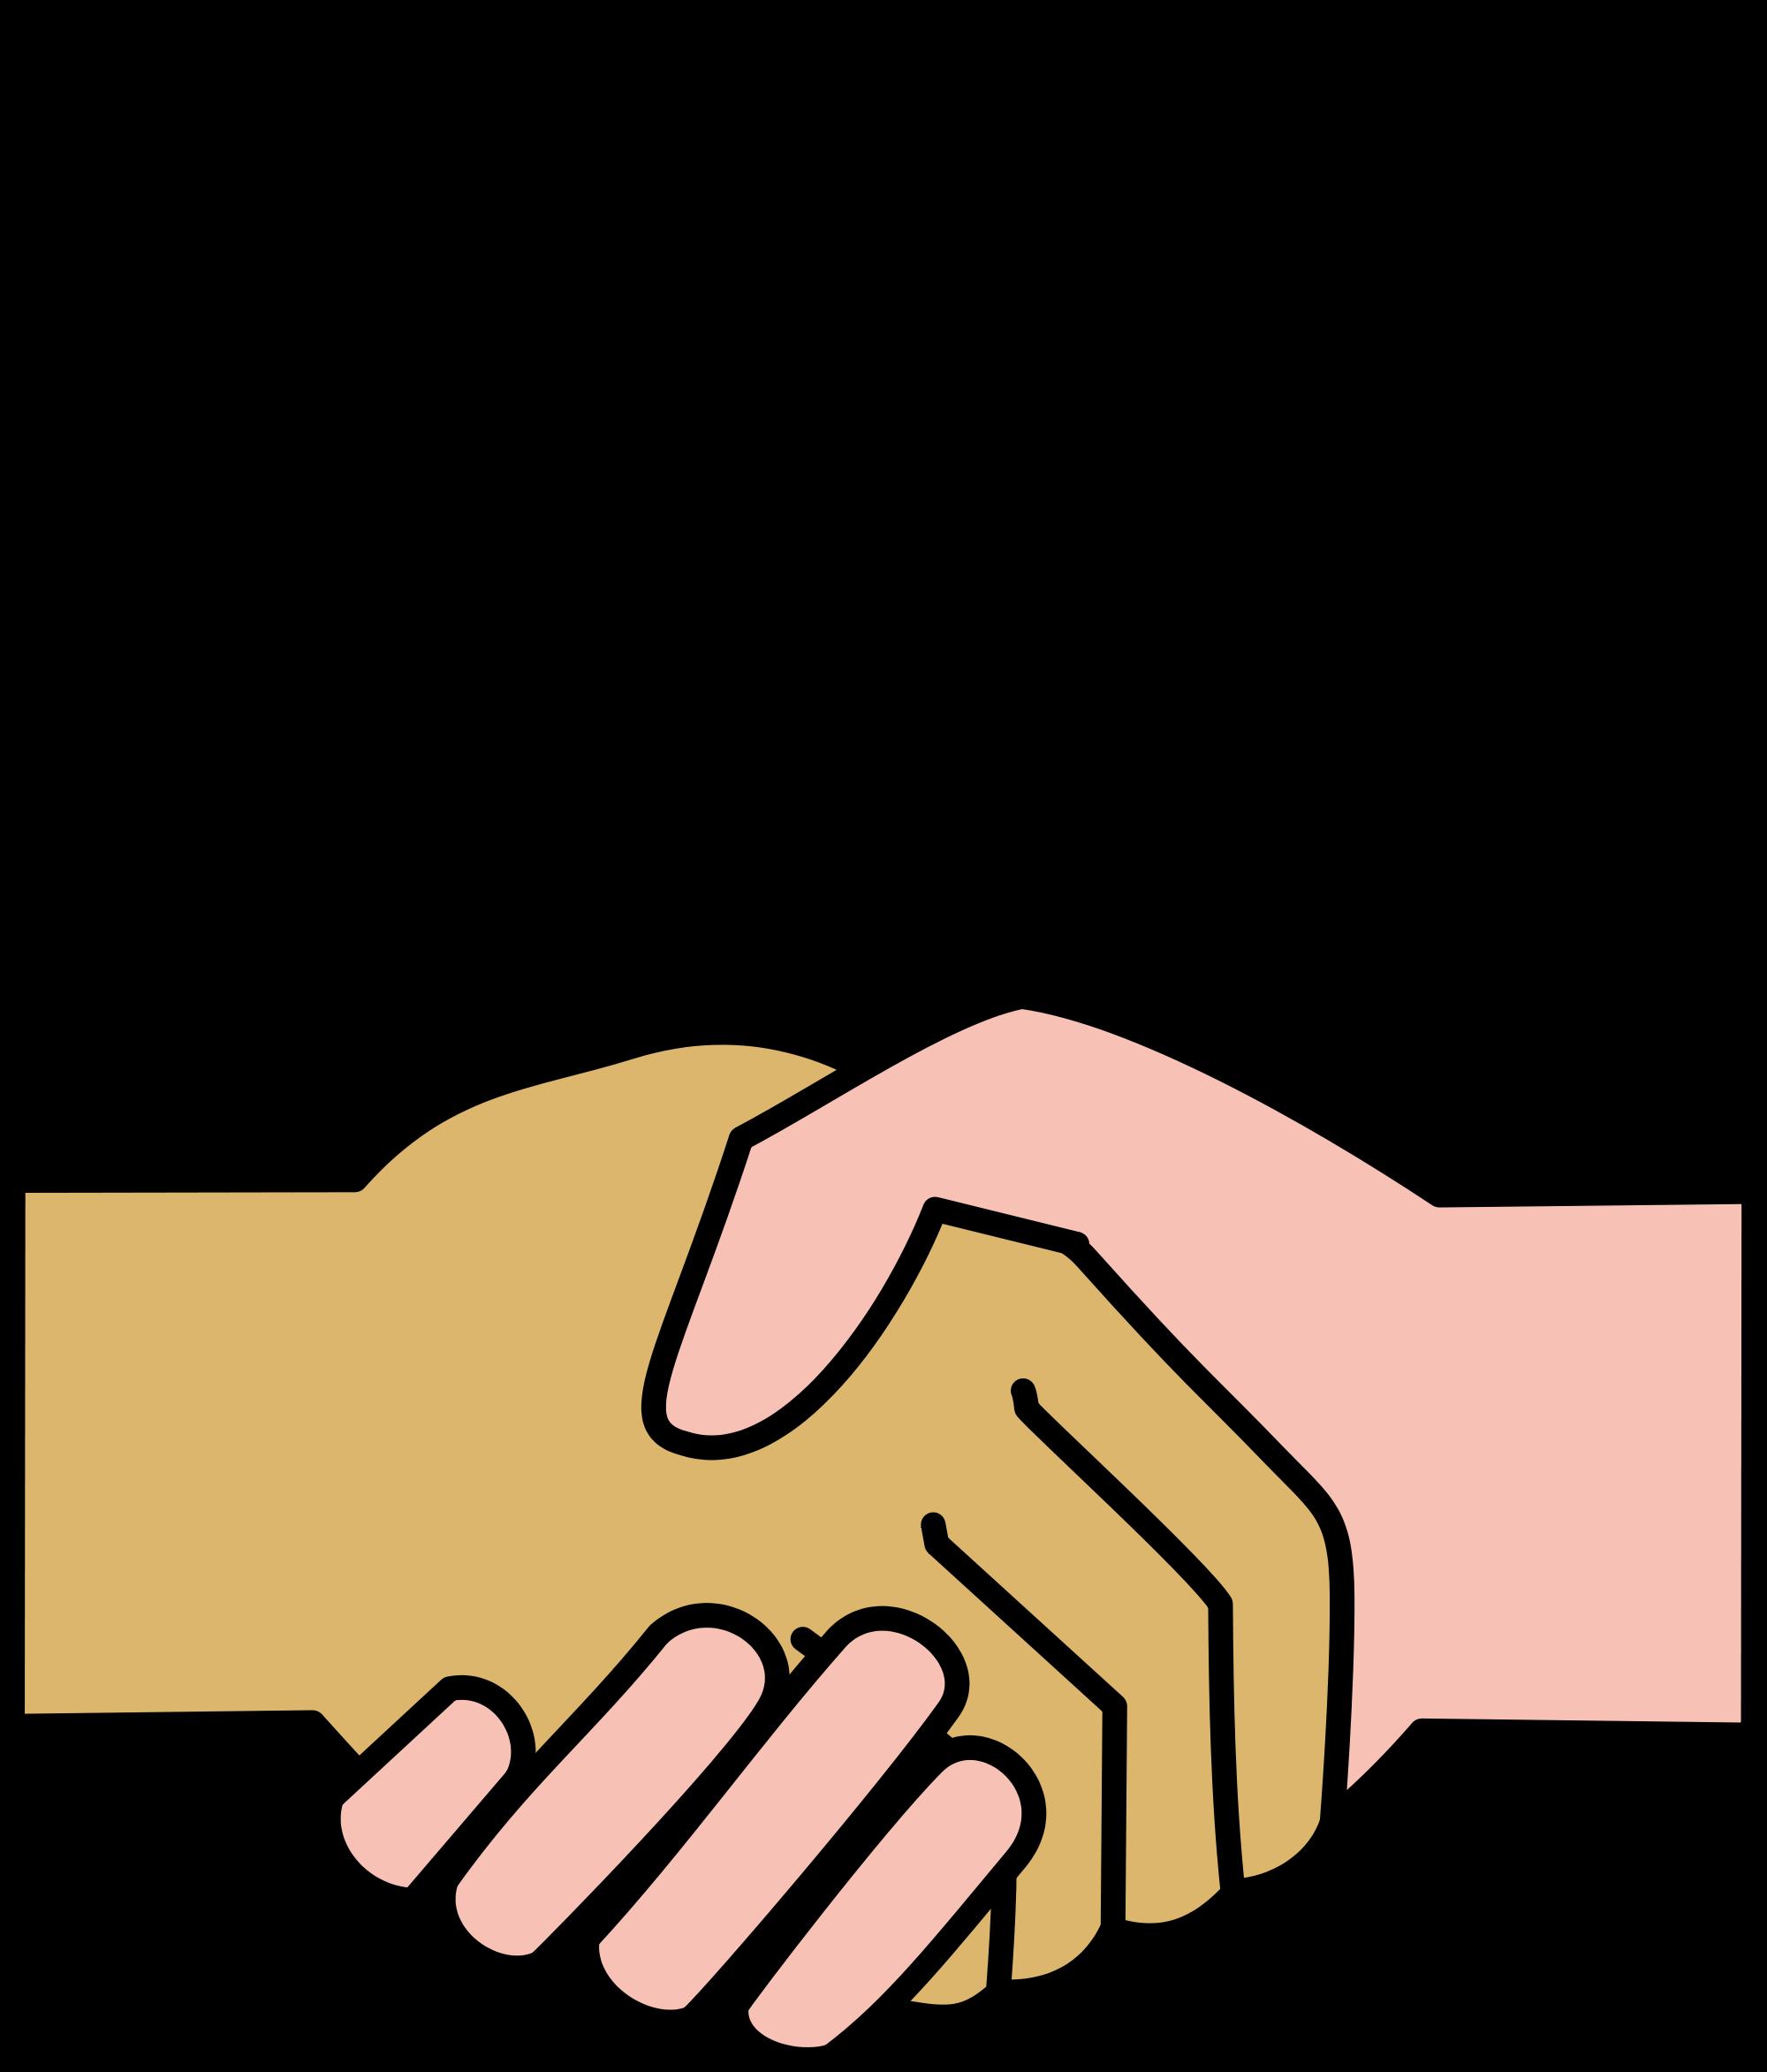 svg transparent stock File christian wikimedia commons. Handshake clipart svg